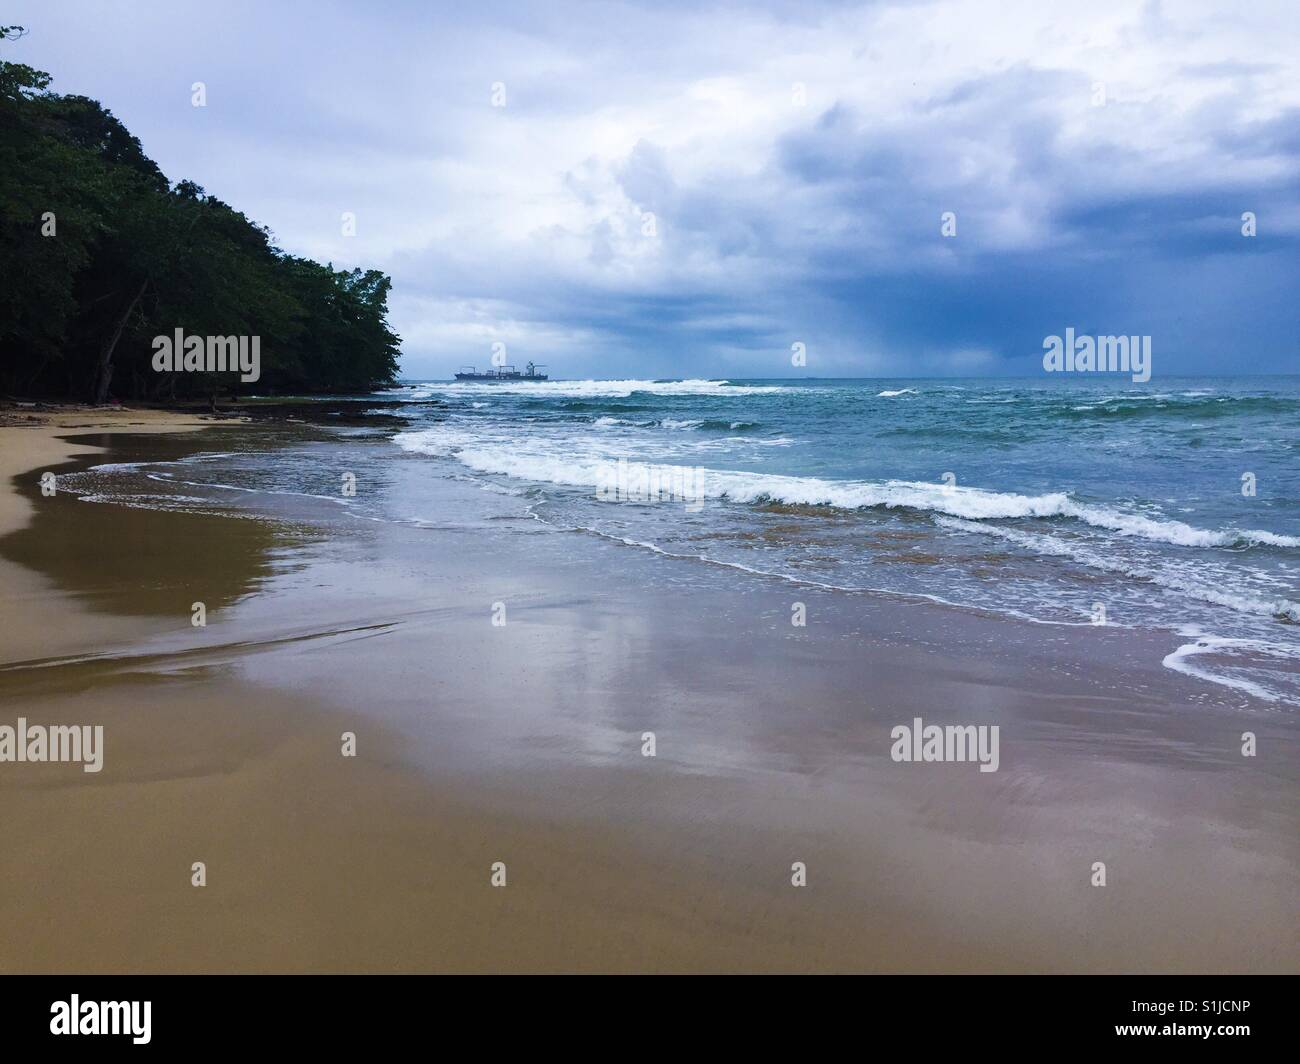 Lonely beach - Stock Image